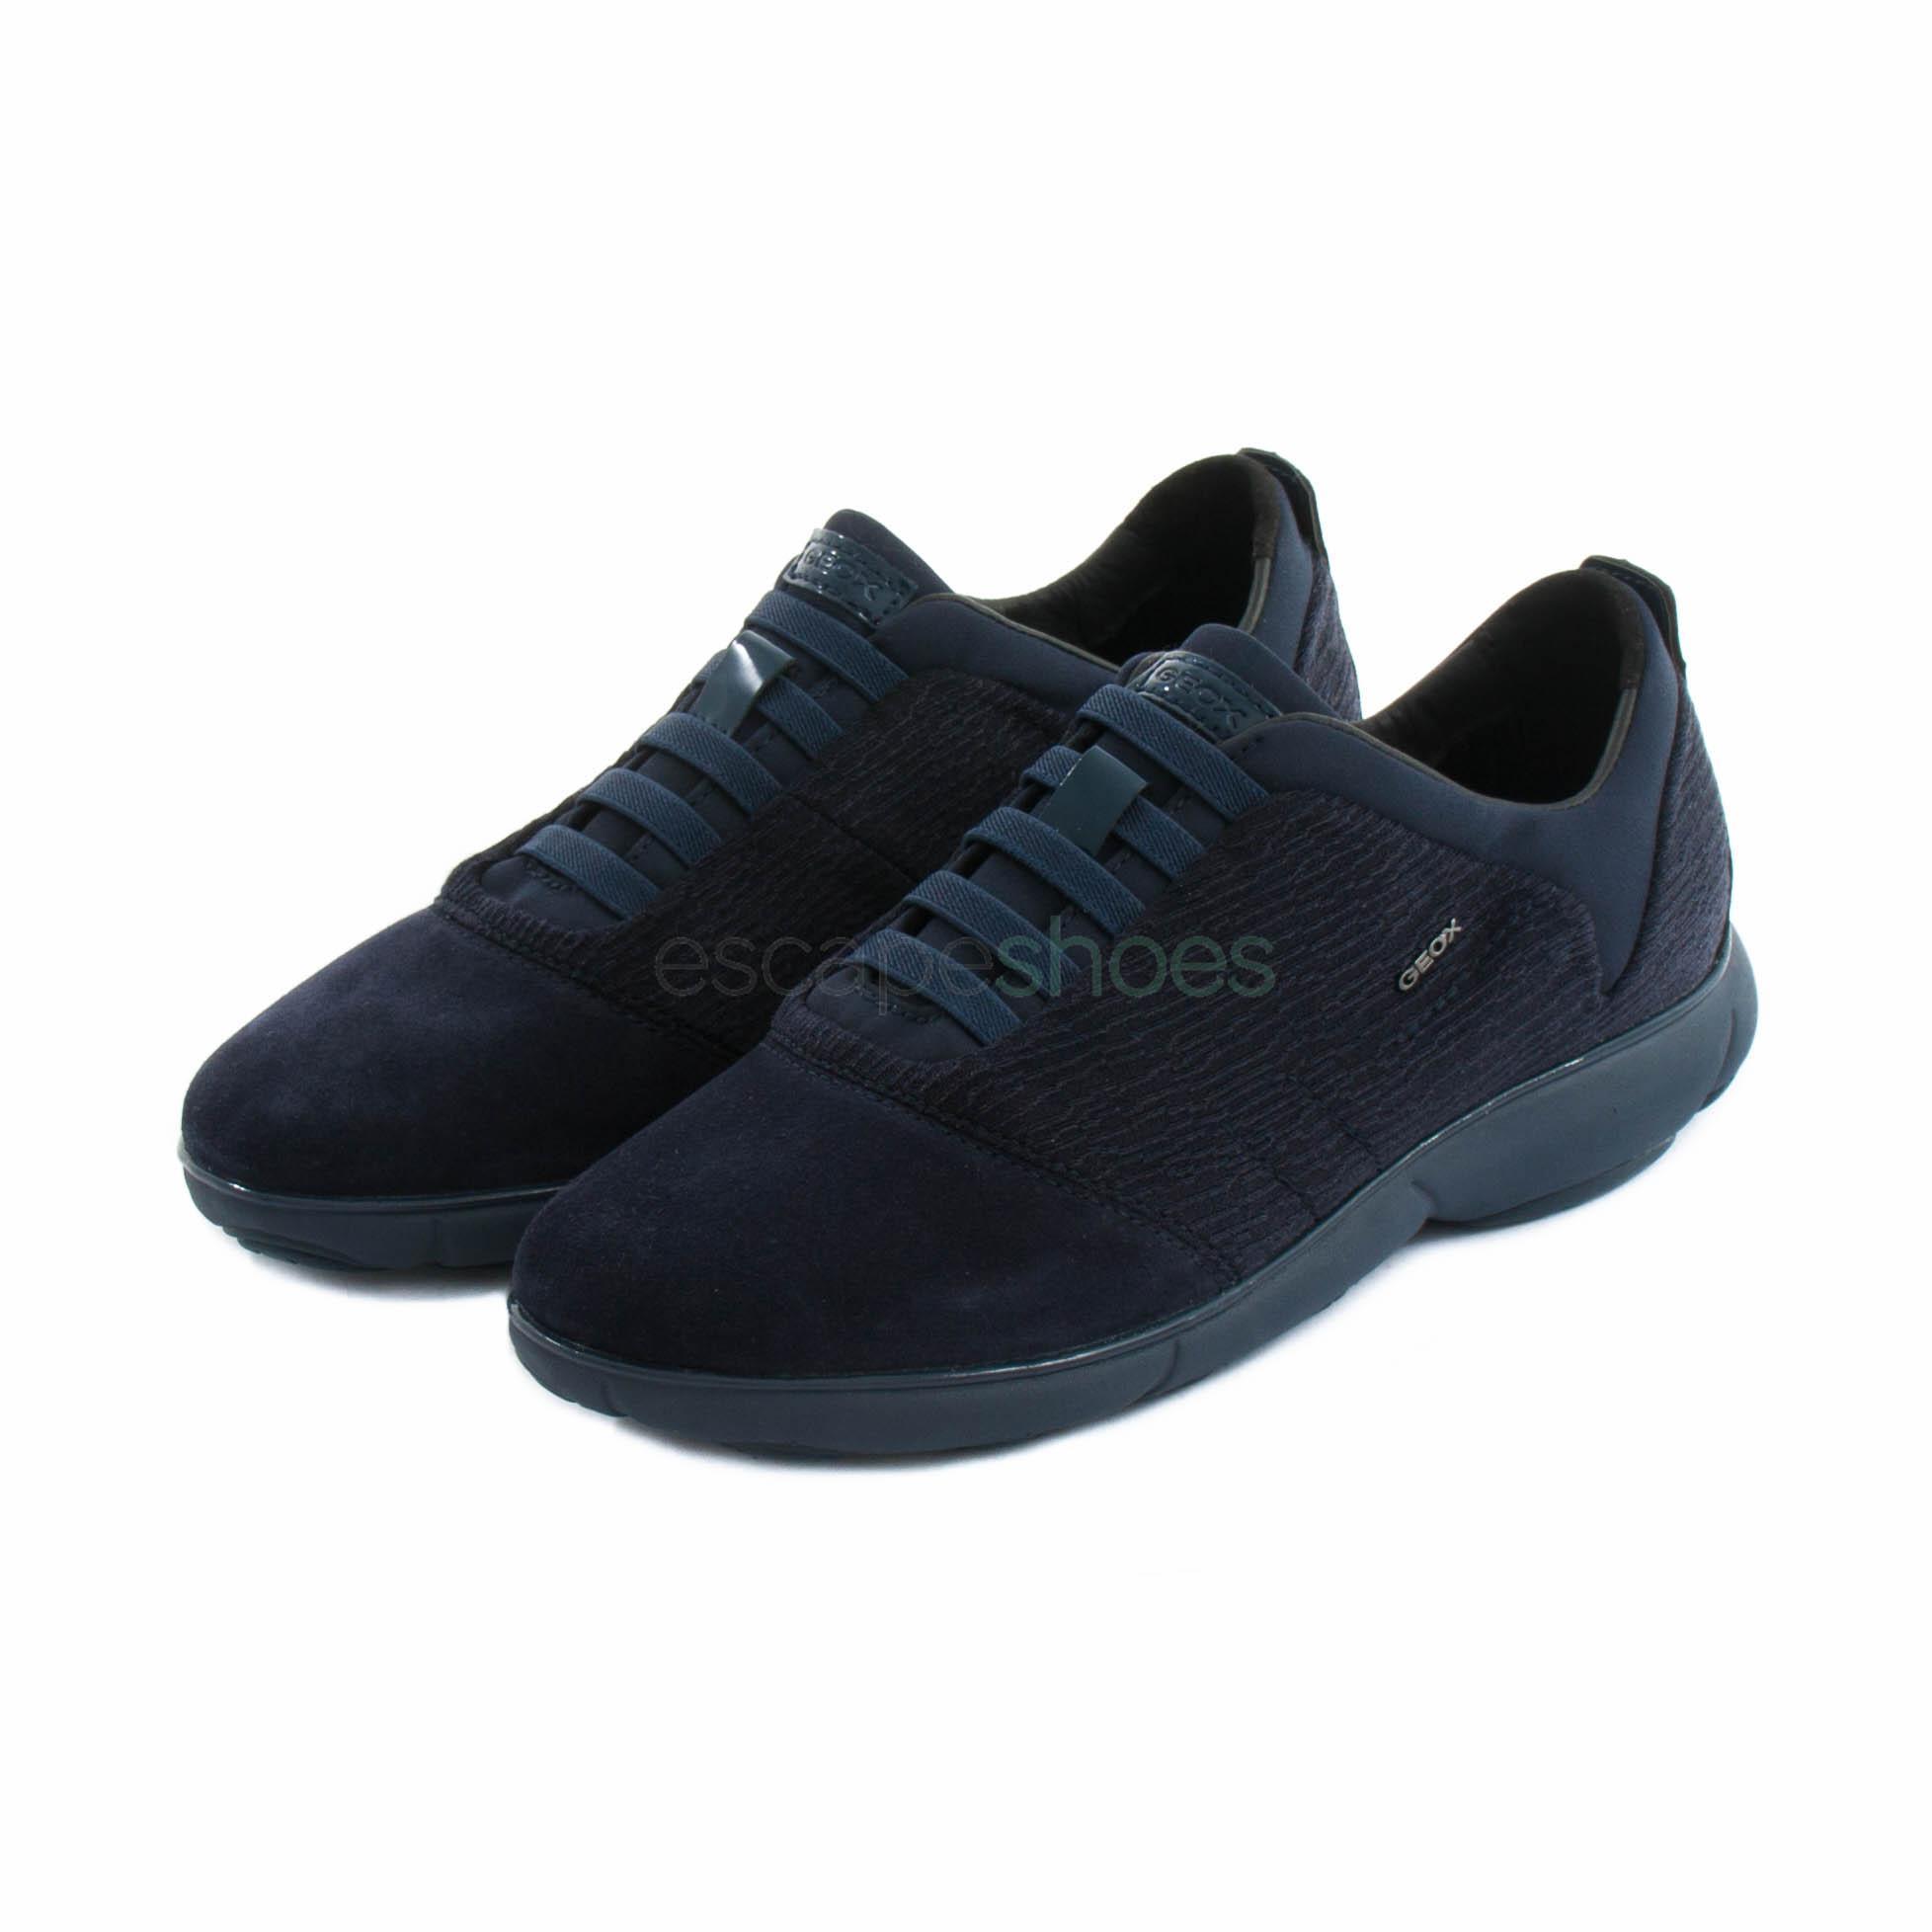 Sneakers GEOX Nebula Navy Blue